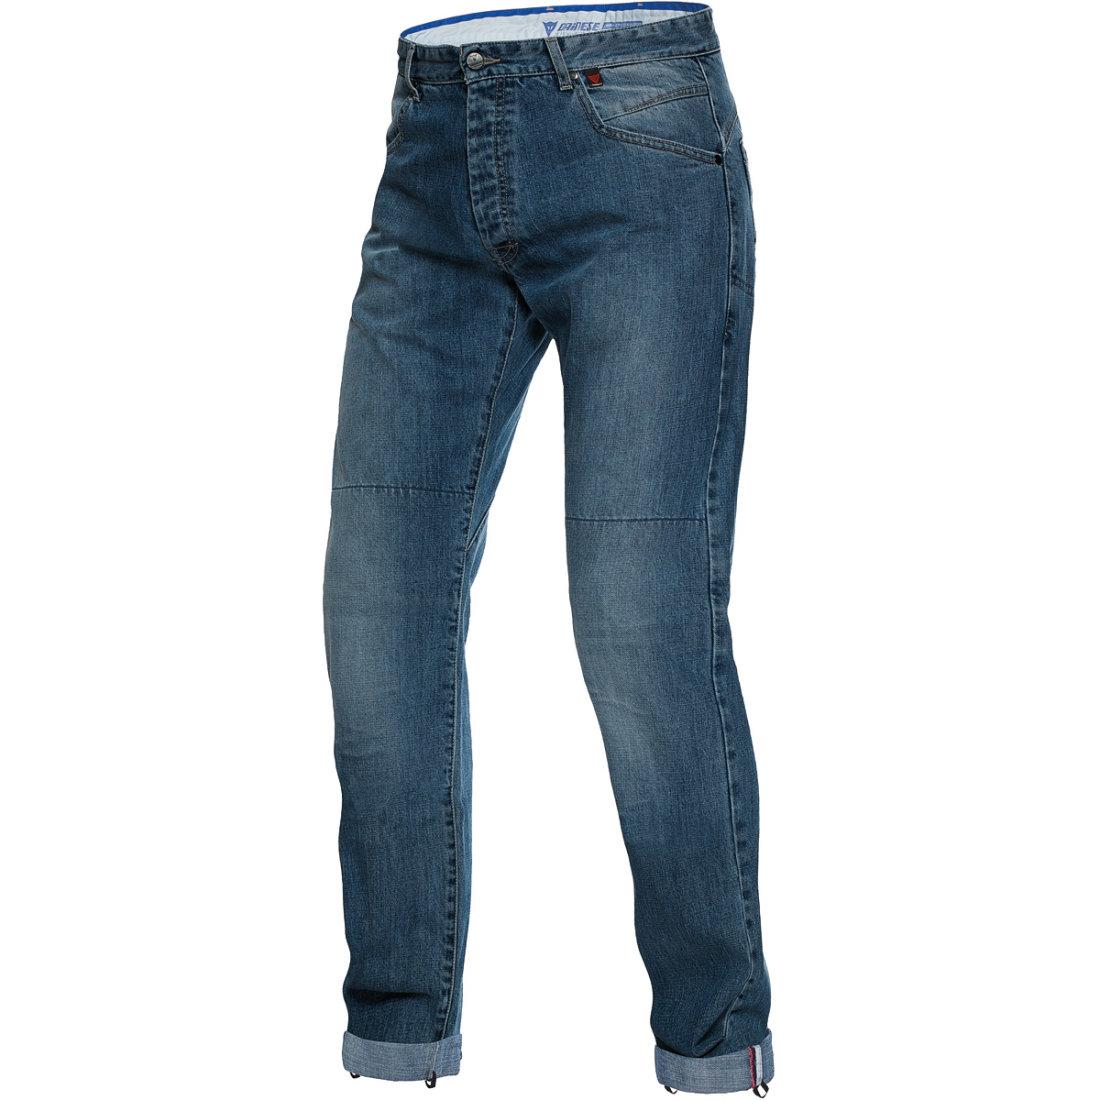 6236998c 328 Pantalones para moto de carretera · Motocard